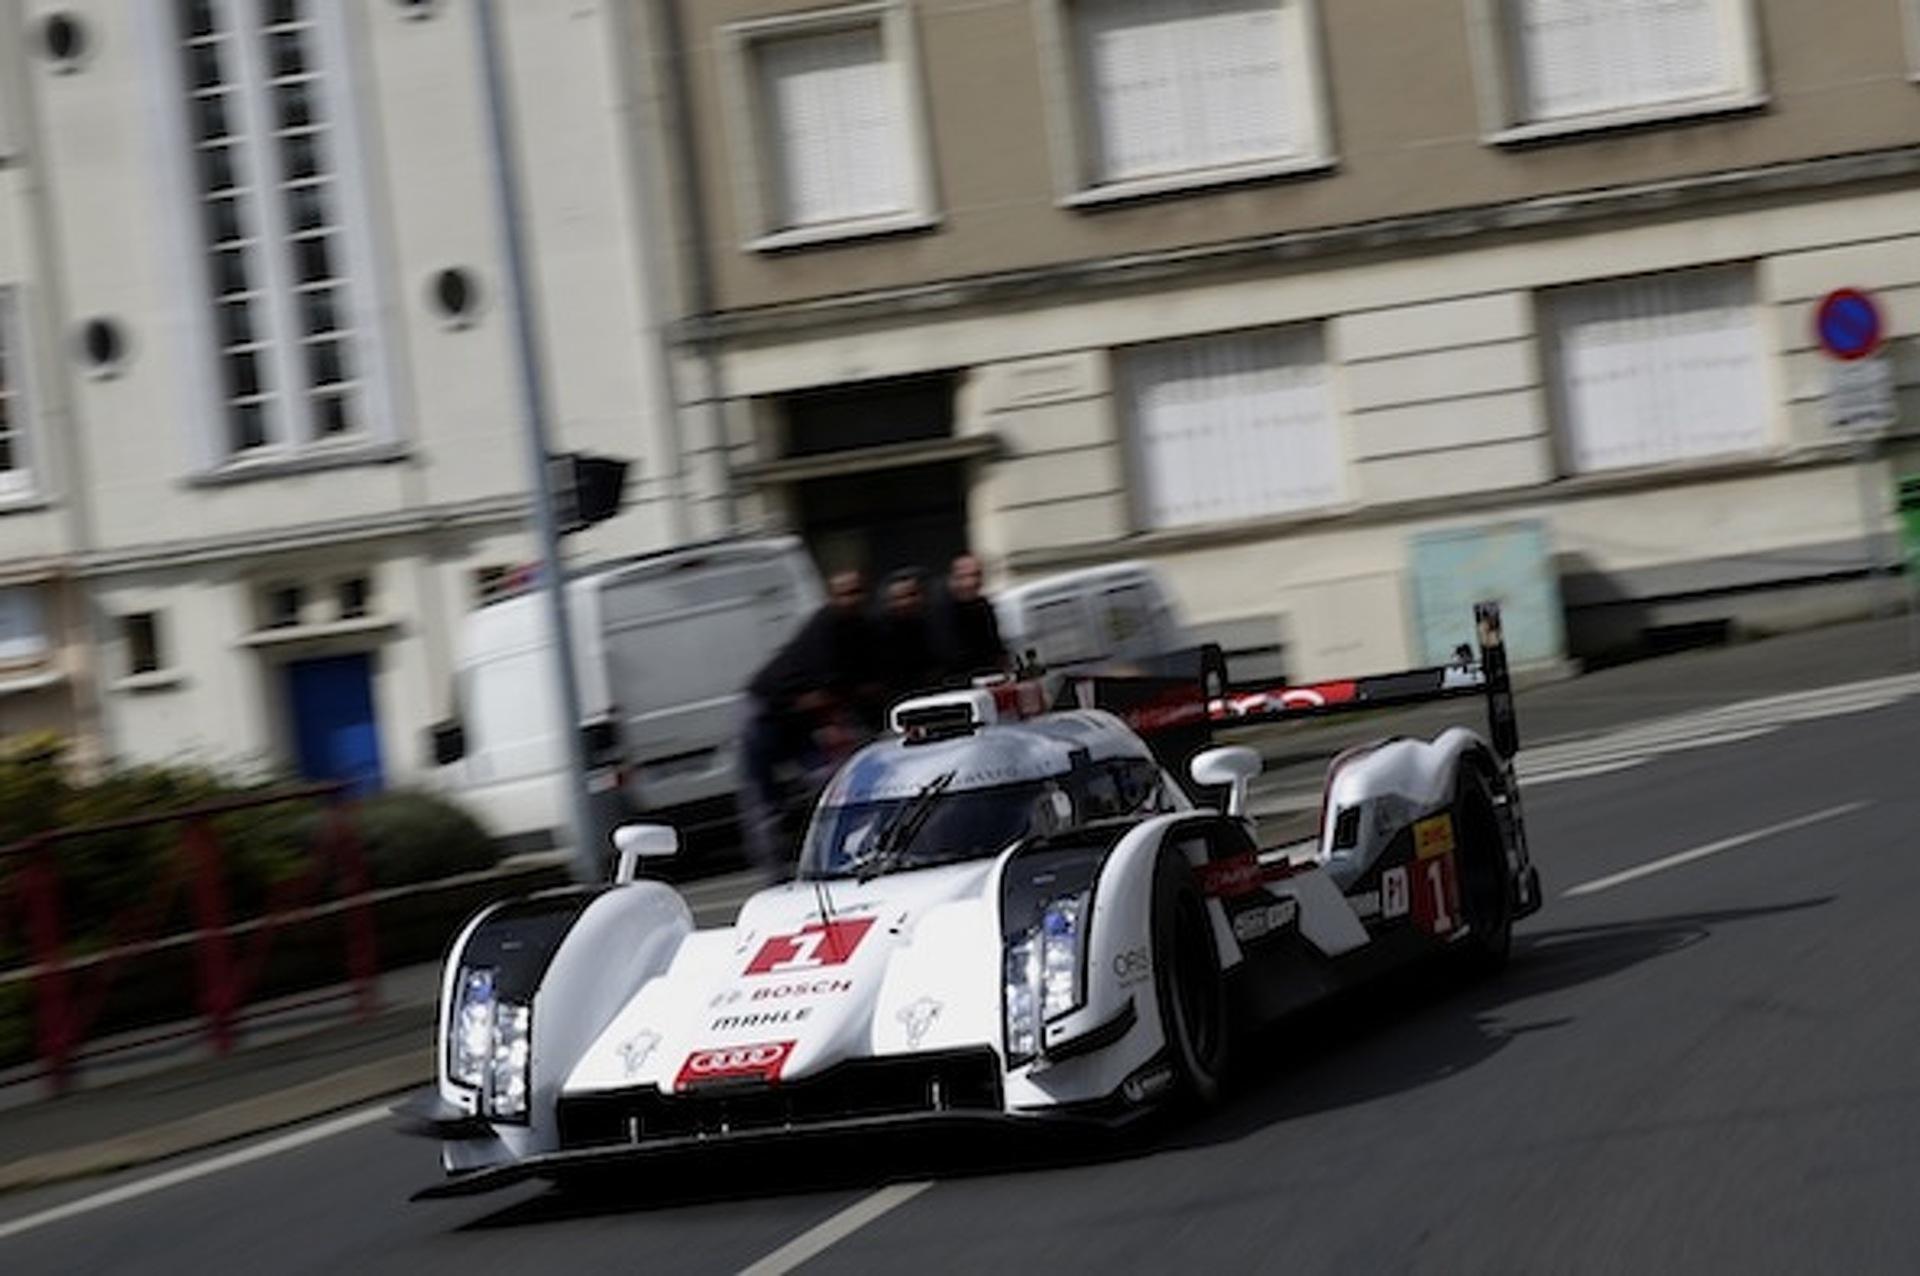 Audi R18 Race Car on Public Streets Is a Fantasy Come True [video]